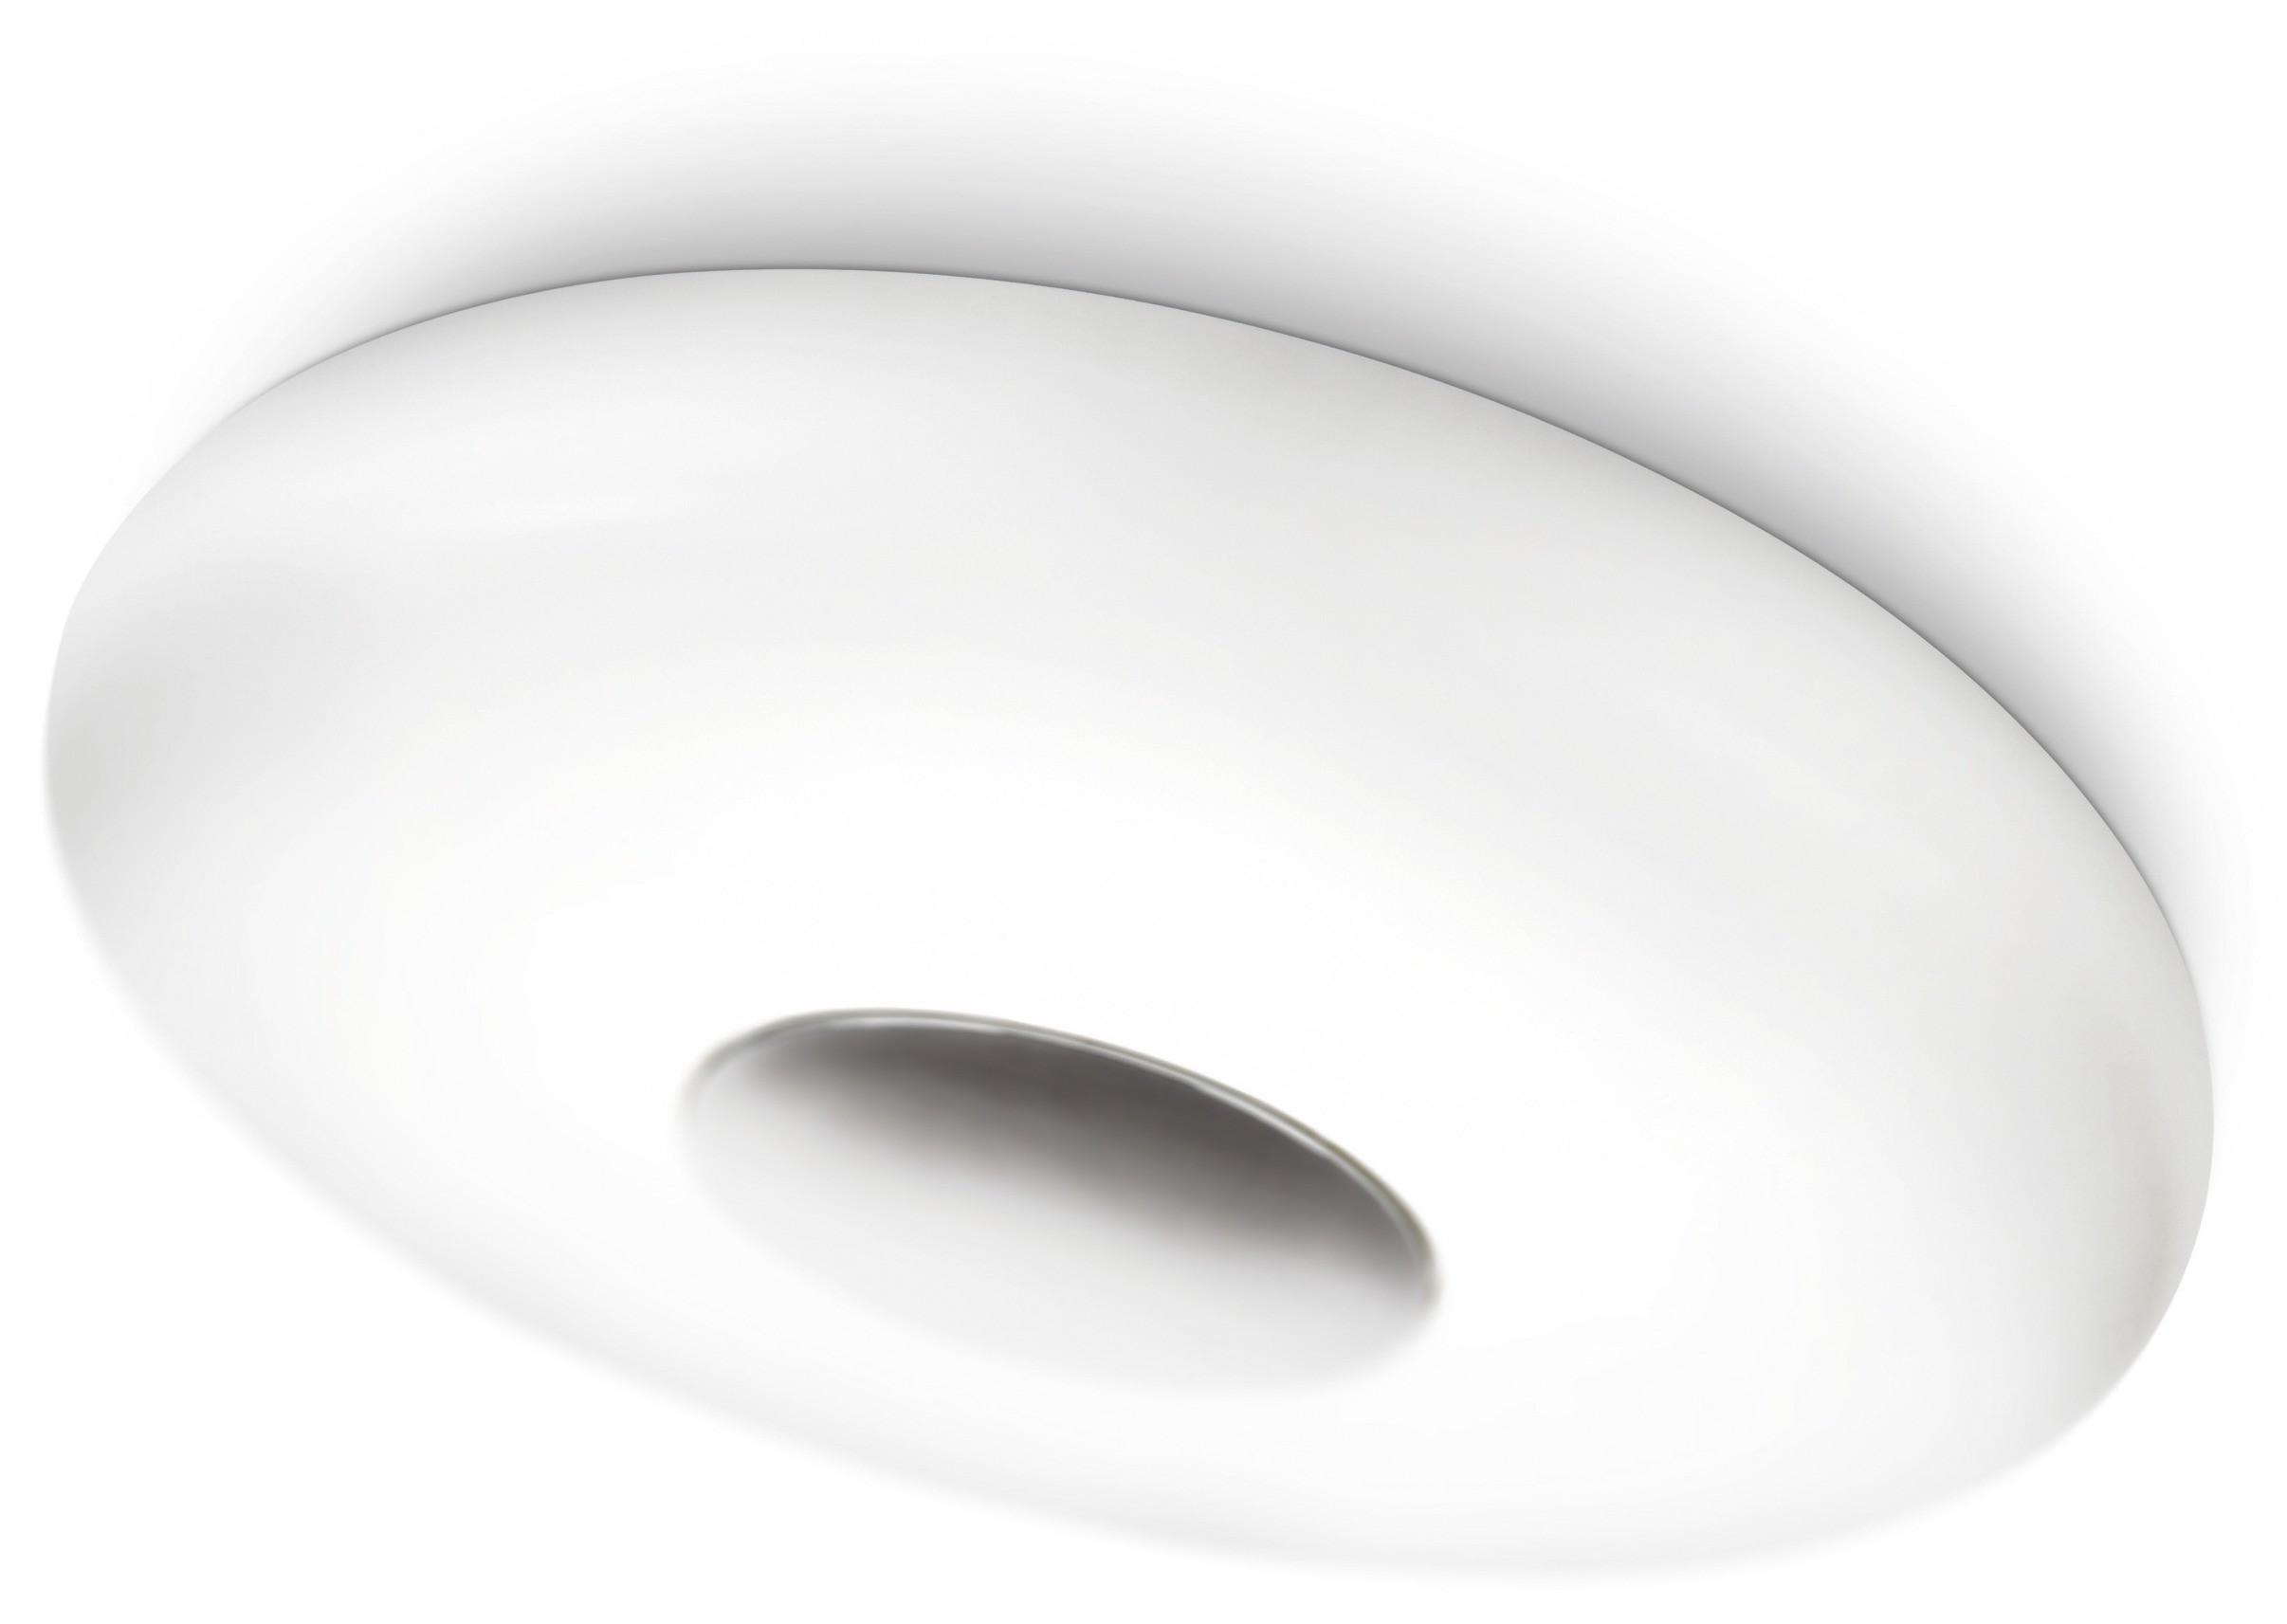 philips plafondlamp badkamer led verlichting watt. Black Bedroom Furniture Sets. Home Design Ideas